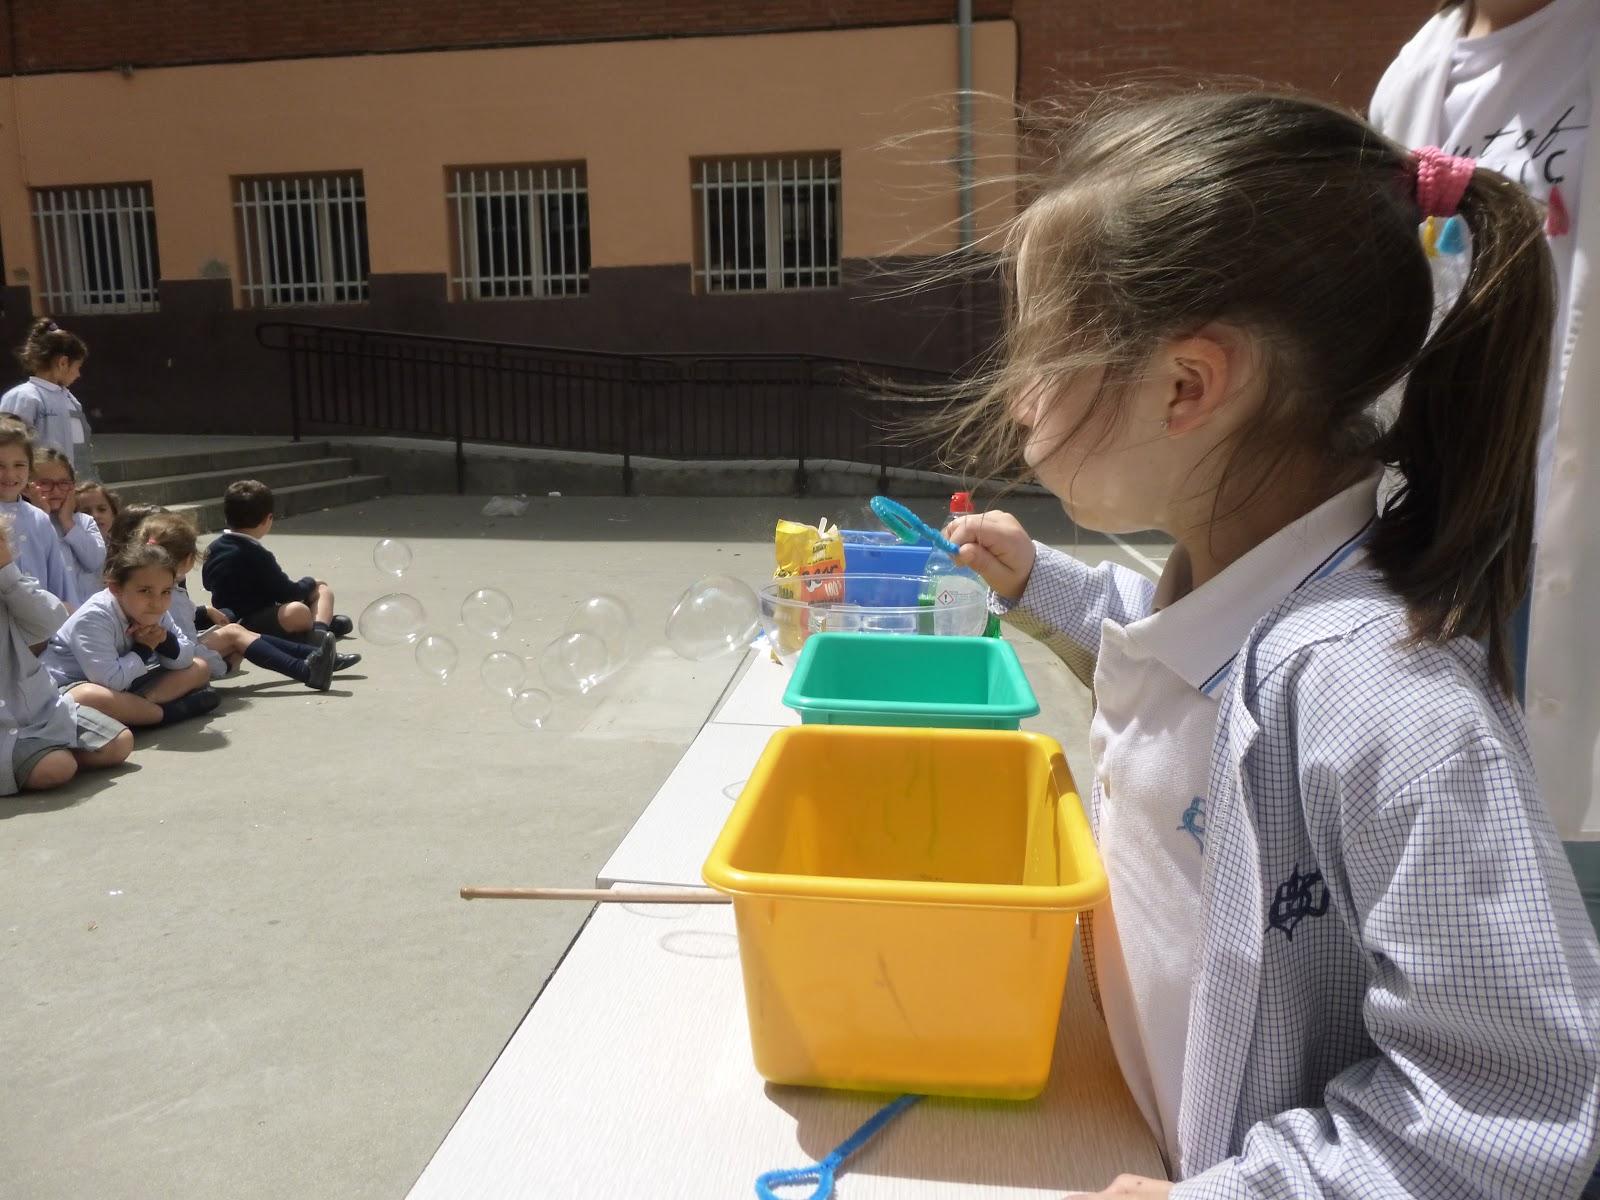 Agustinas Valladolid - 2017 - Infantil 5 - Experimento